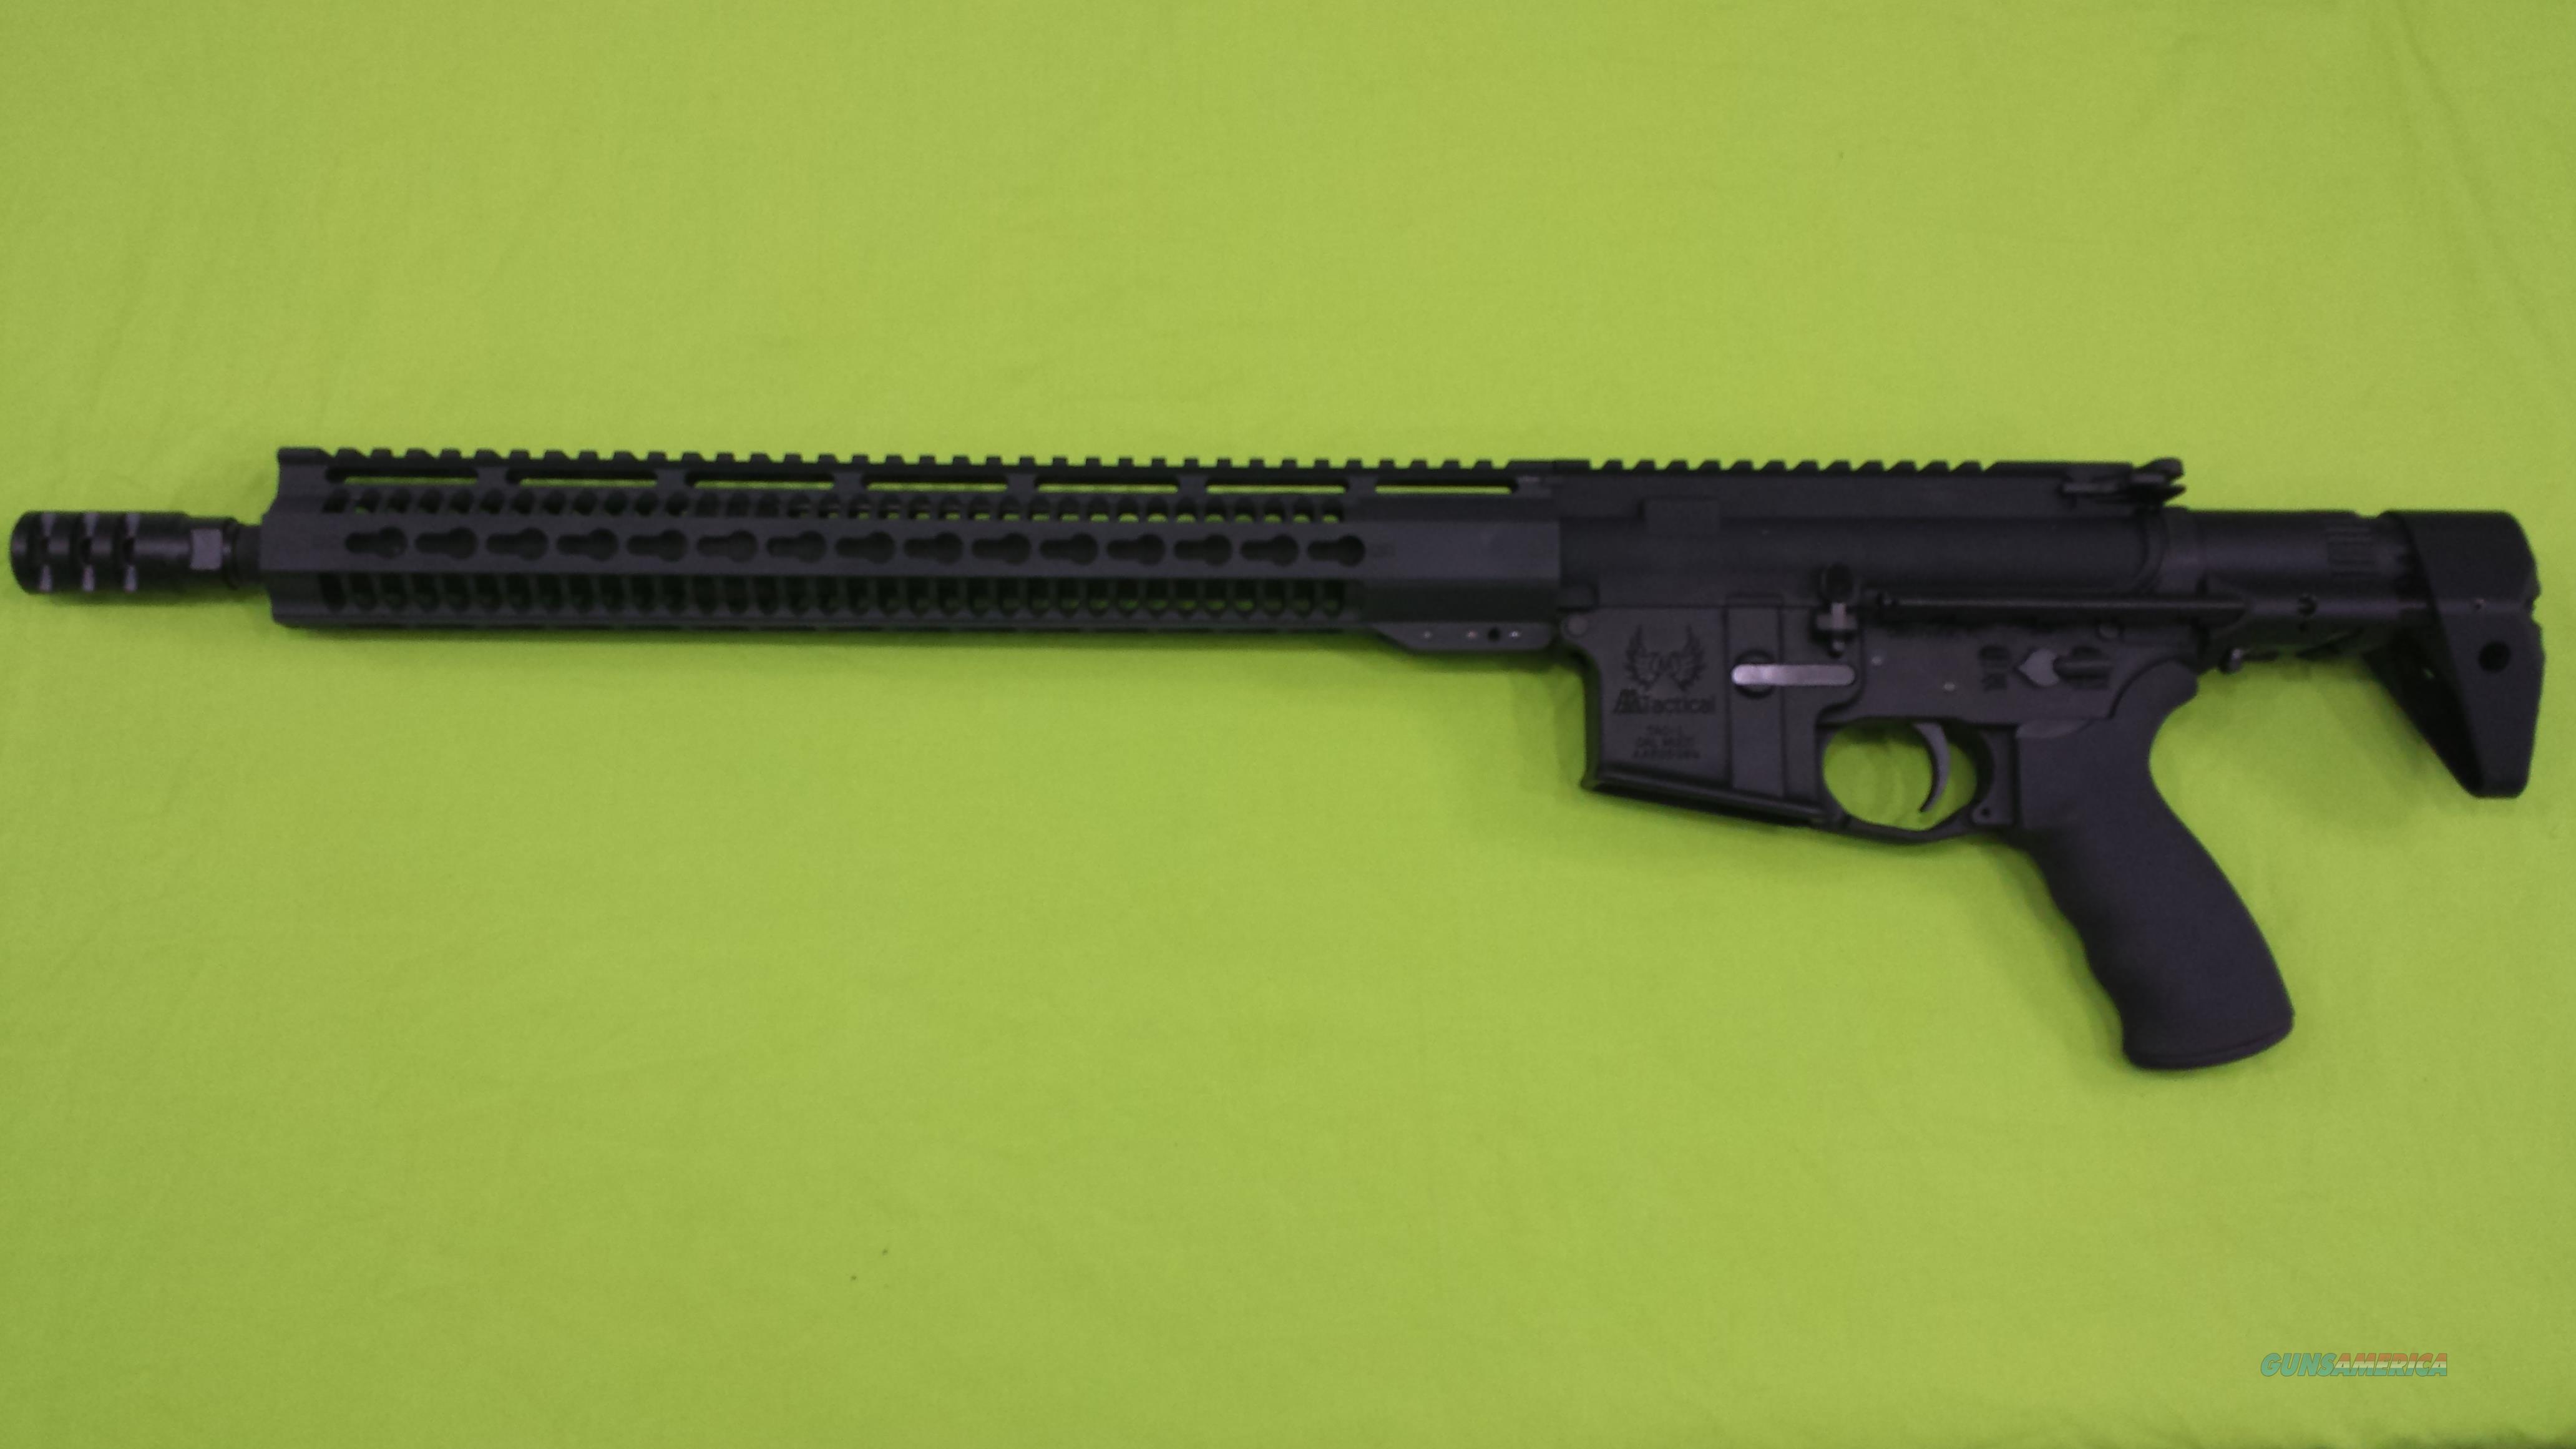 AA TACTICAL TAC-L 5.56 TROY PDW STOCK BLACK AR15   Guns > Rifles > Troy Defense > Troy Defense Rifles